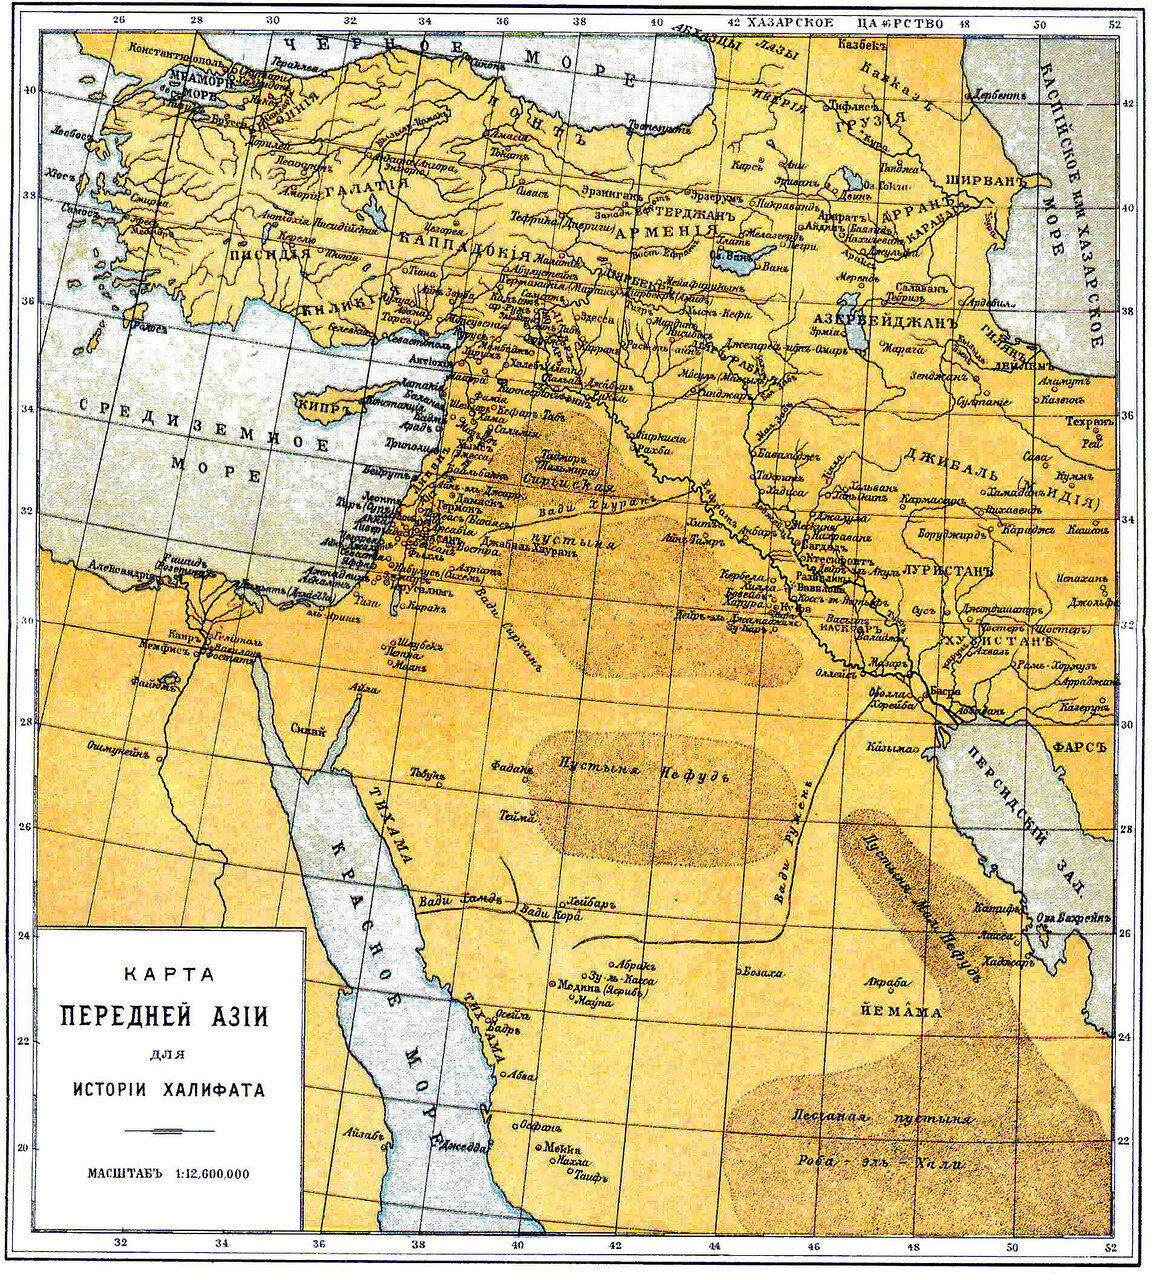 Передняя Азия периода халифата